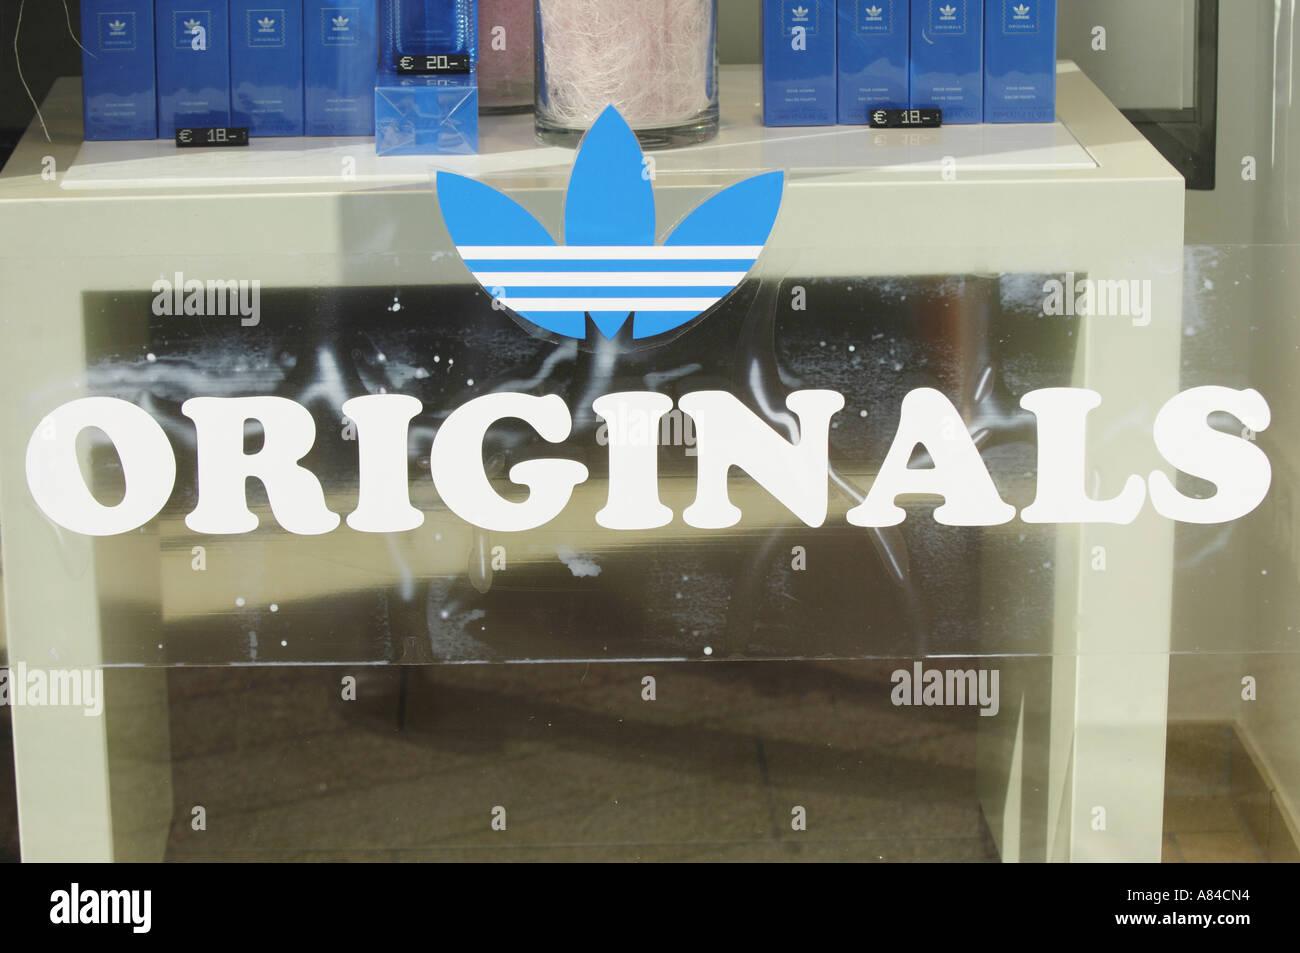 7d478351c9fa8a adidas sportswear sporting goods french adi dassler german europe european  originals retro clothing footwera training shoes